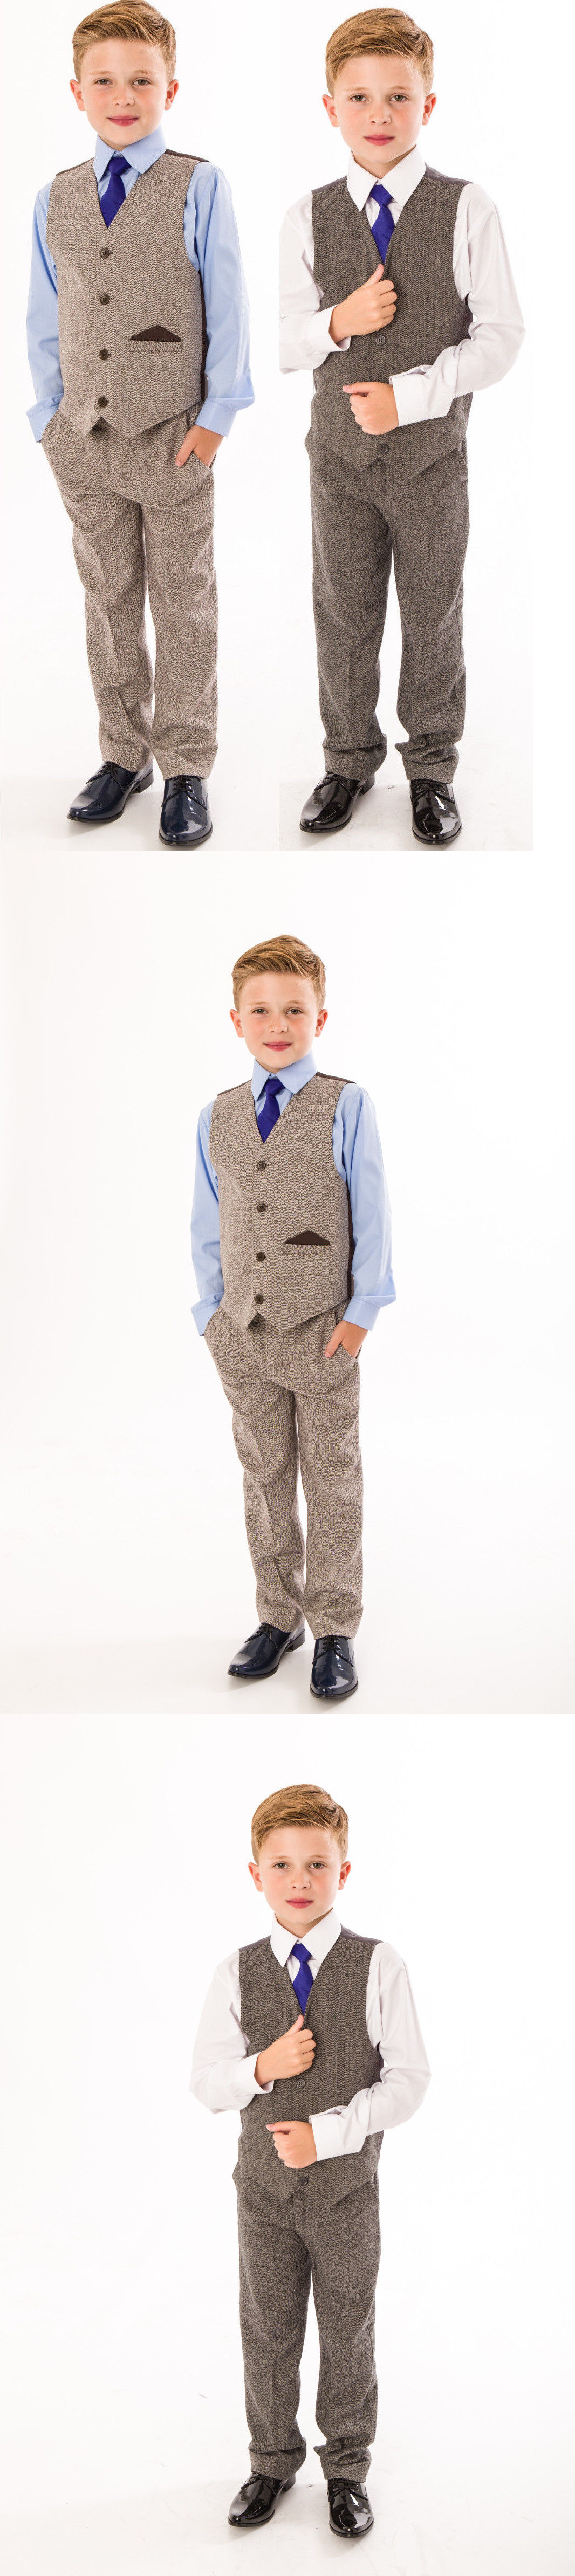 Suits 99754: Boys Suits Boys Wedding Suit Tweed Waistcoat Suit ...